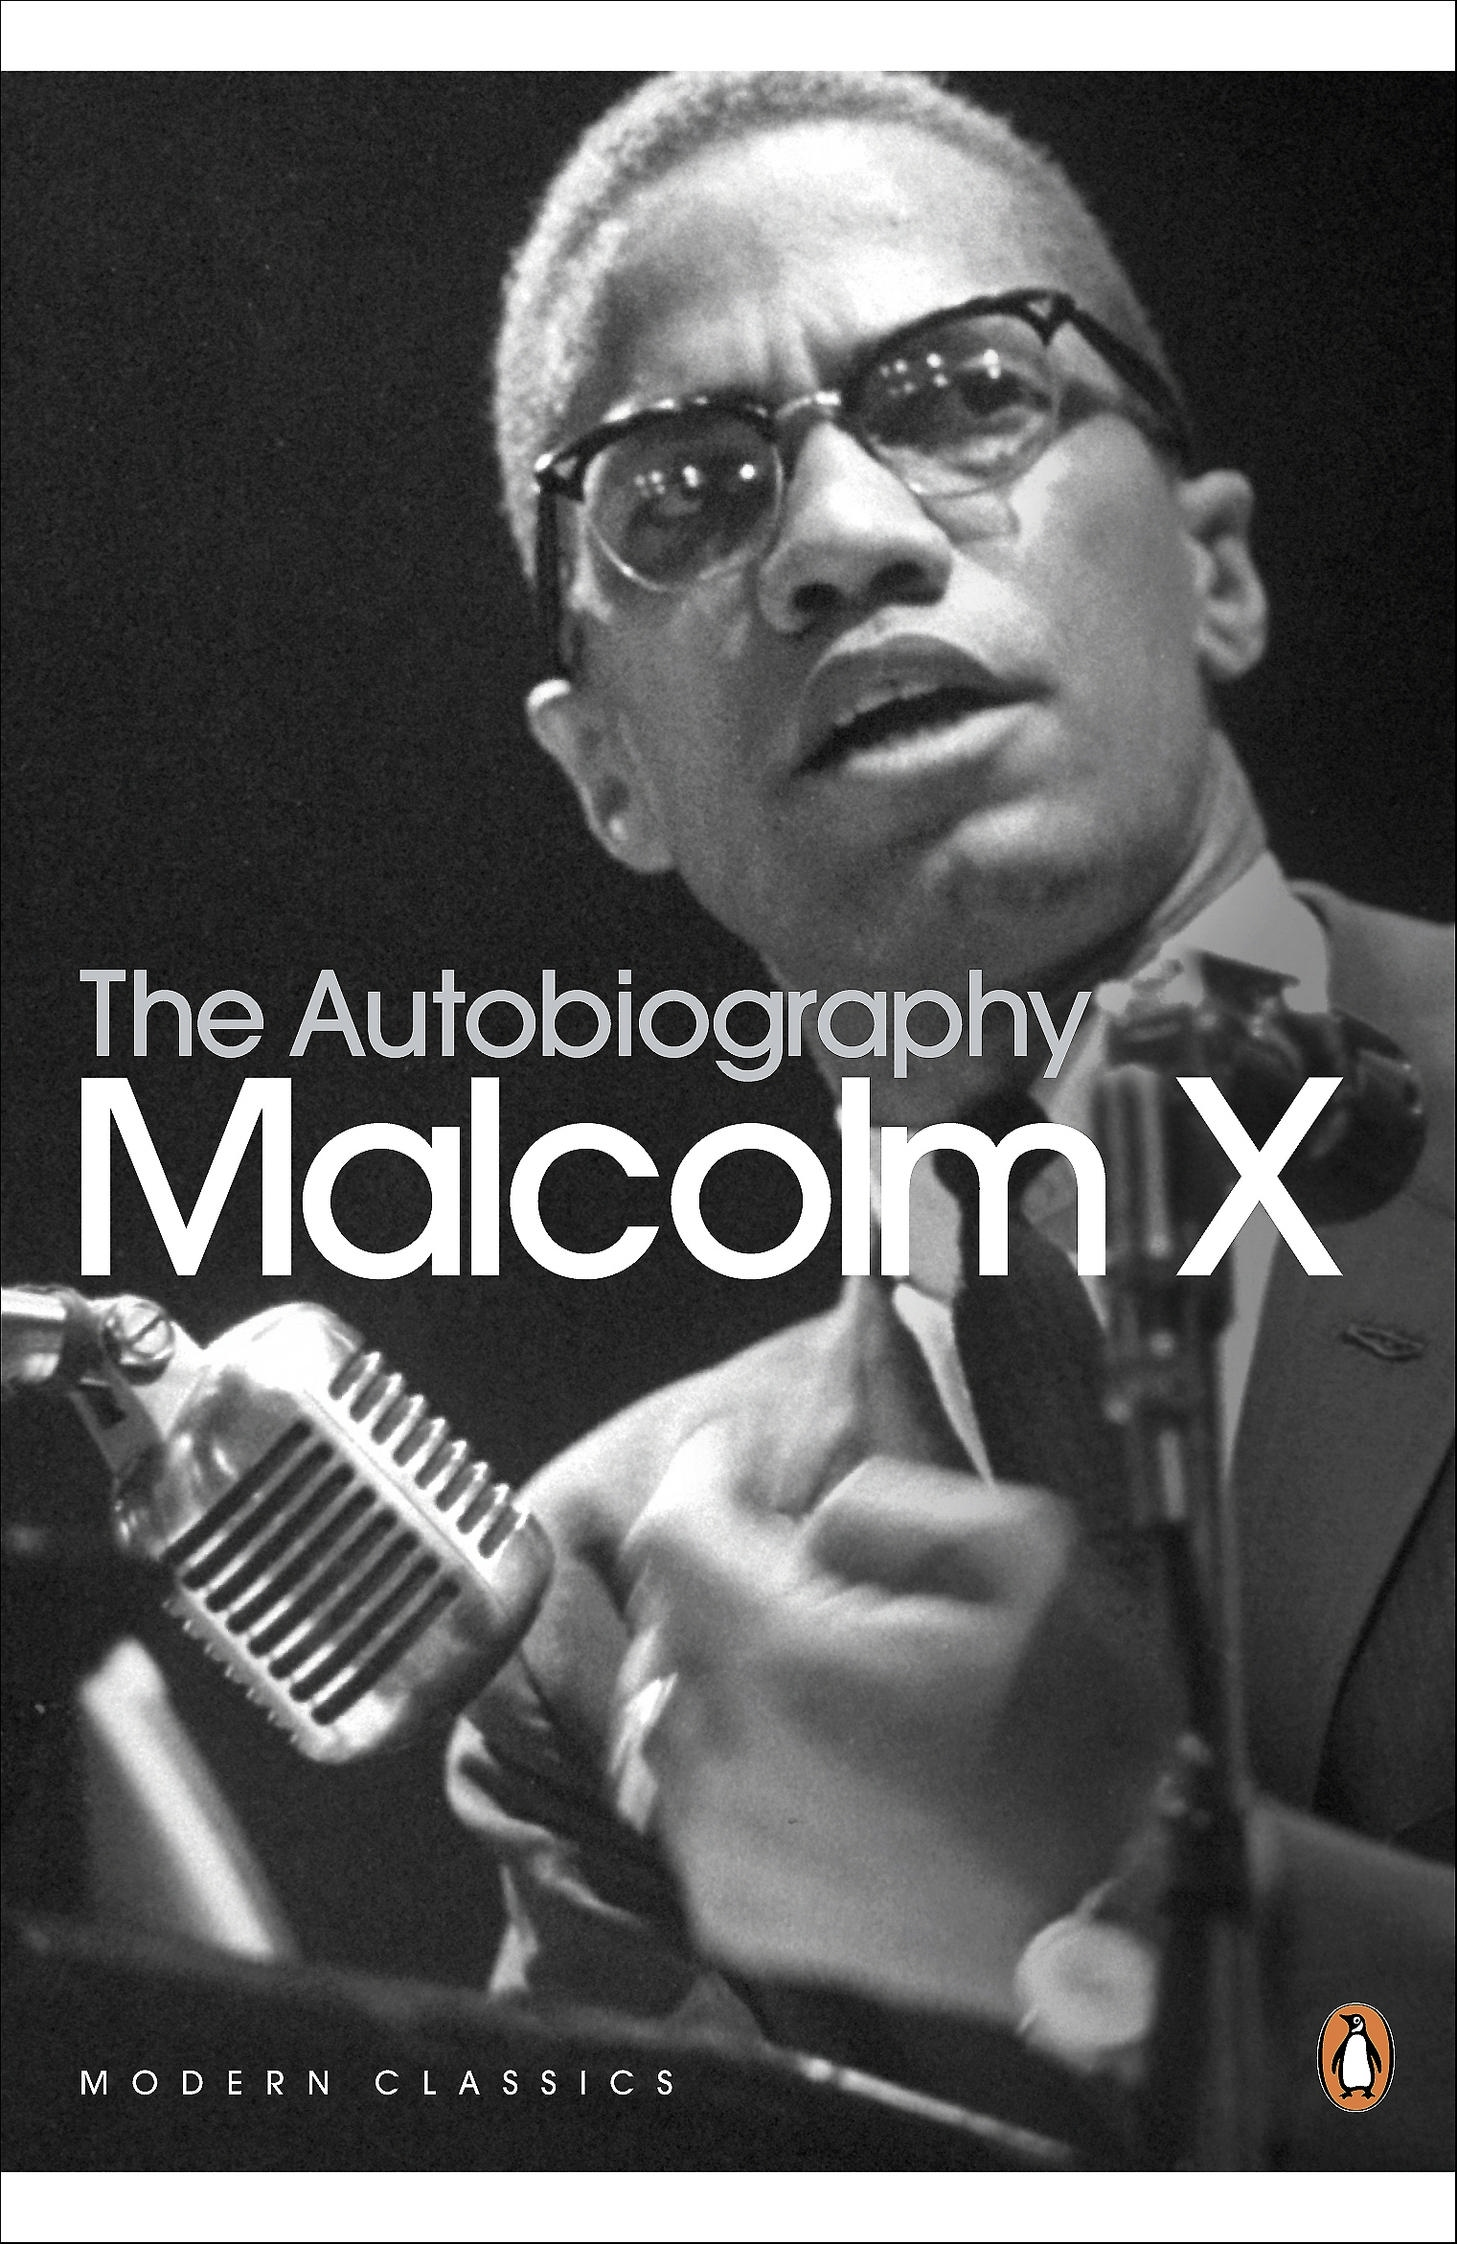 autobiographyofmalcolmx.jpg